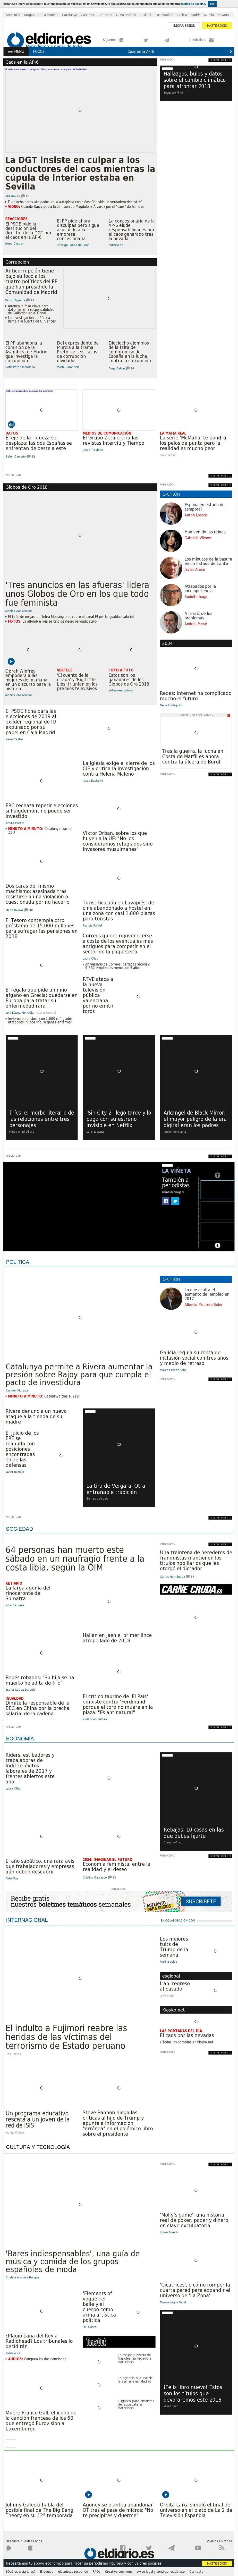 El Diario at Monday Jan. 8, 2018, 1:05 p.m. UTC